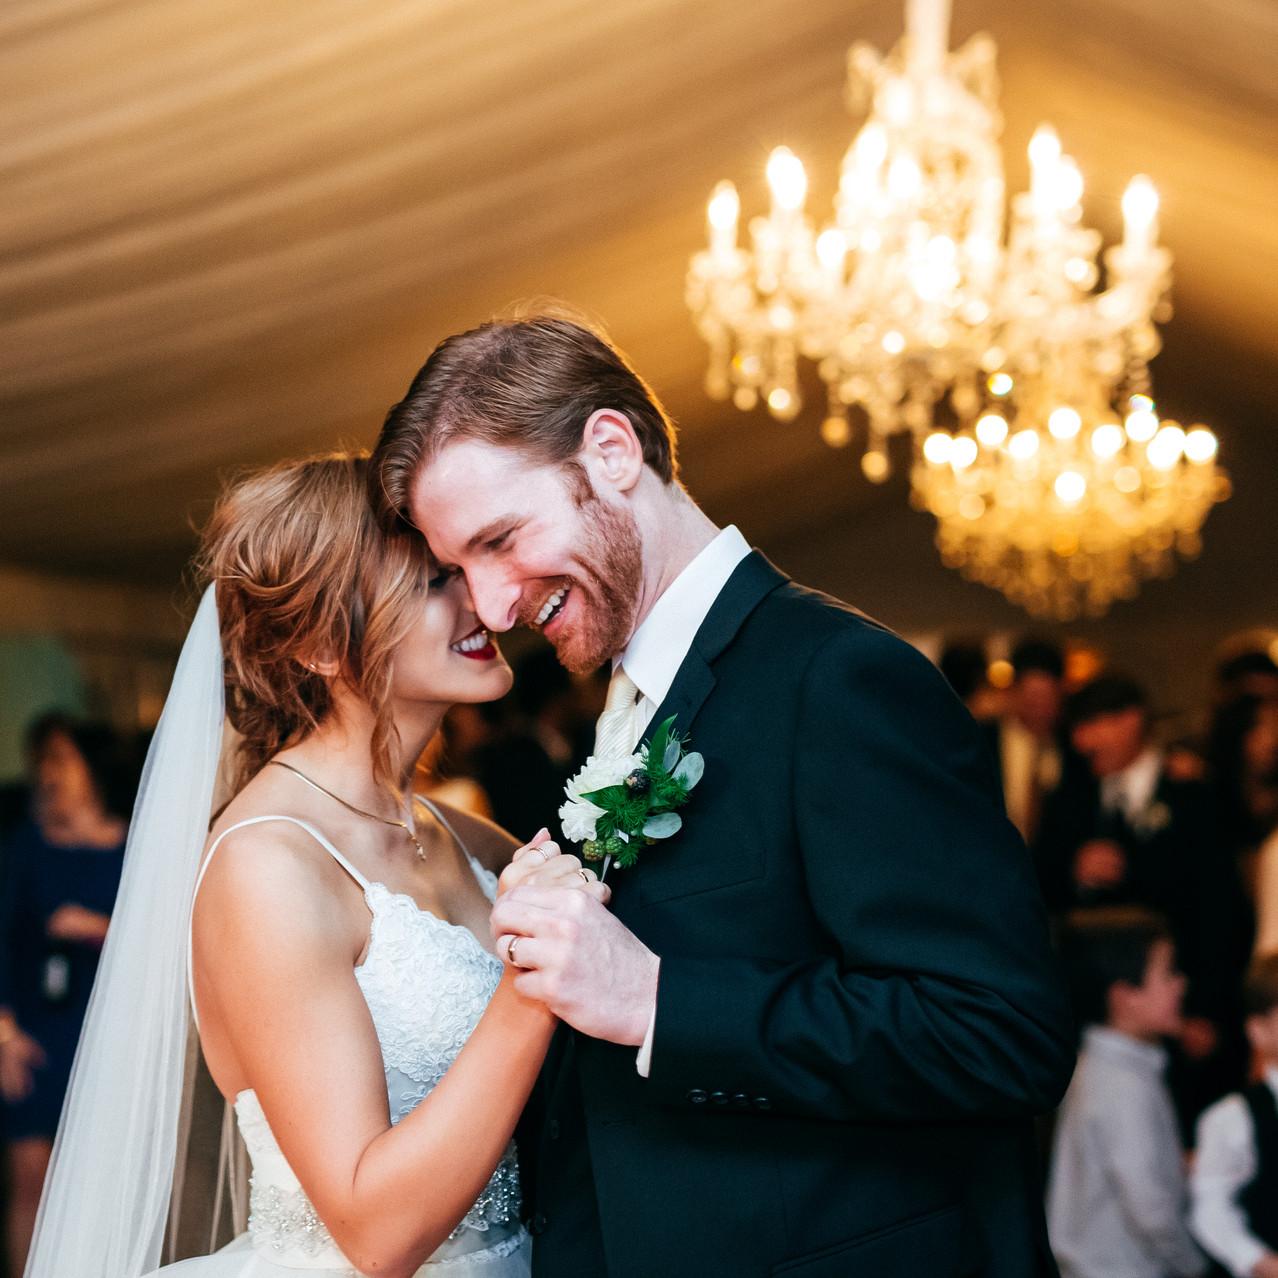 TaylorStewart-Wedding-Reception-15